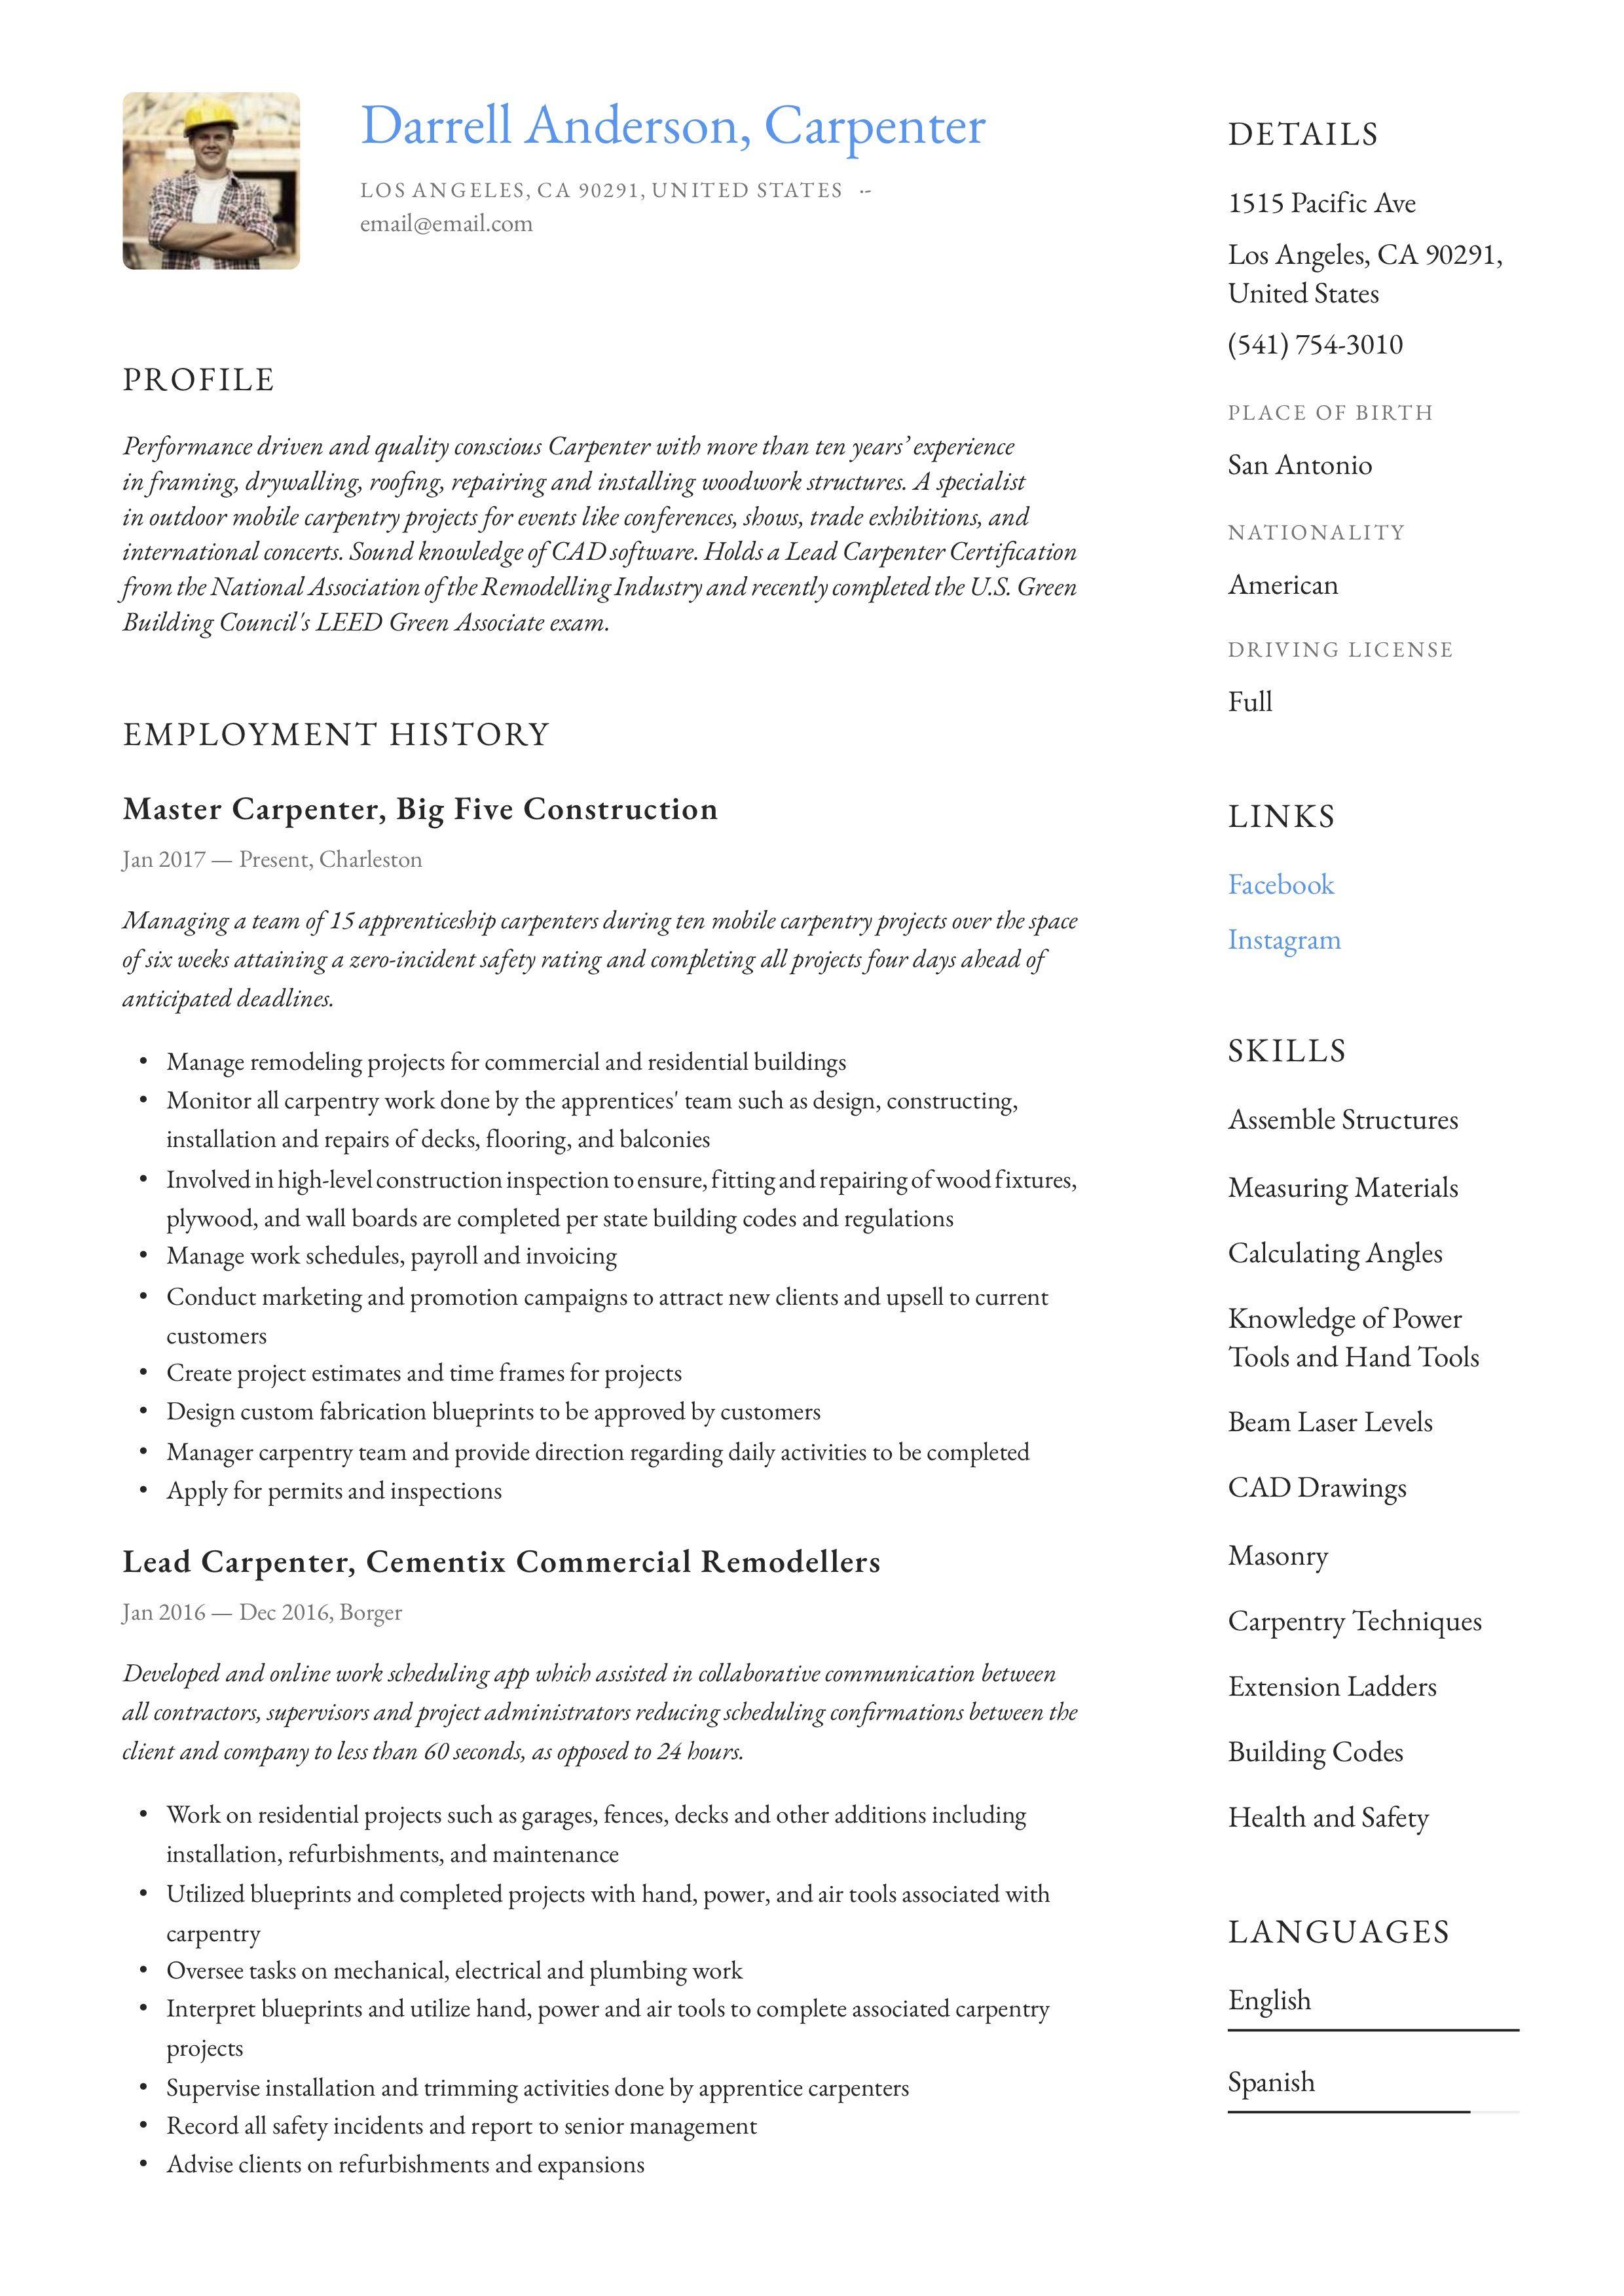 Modern Carpenter Resume, template, design, tips, examples